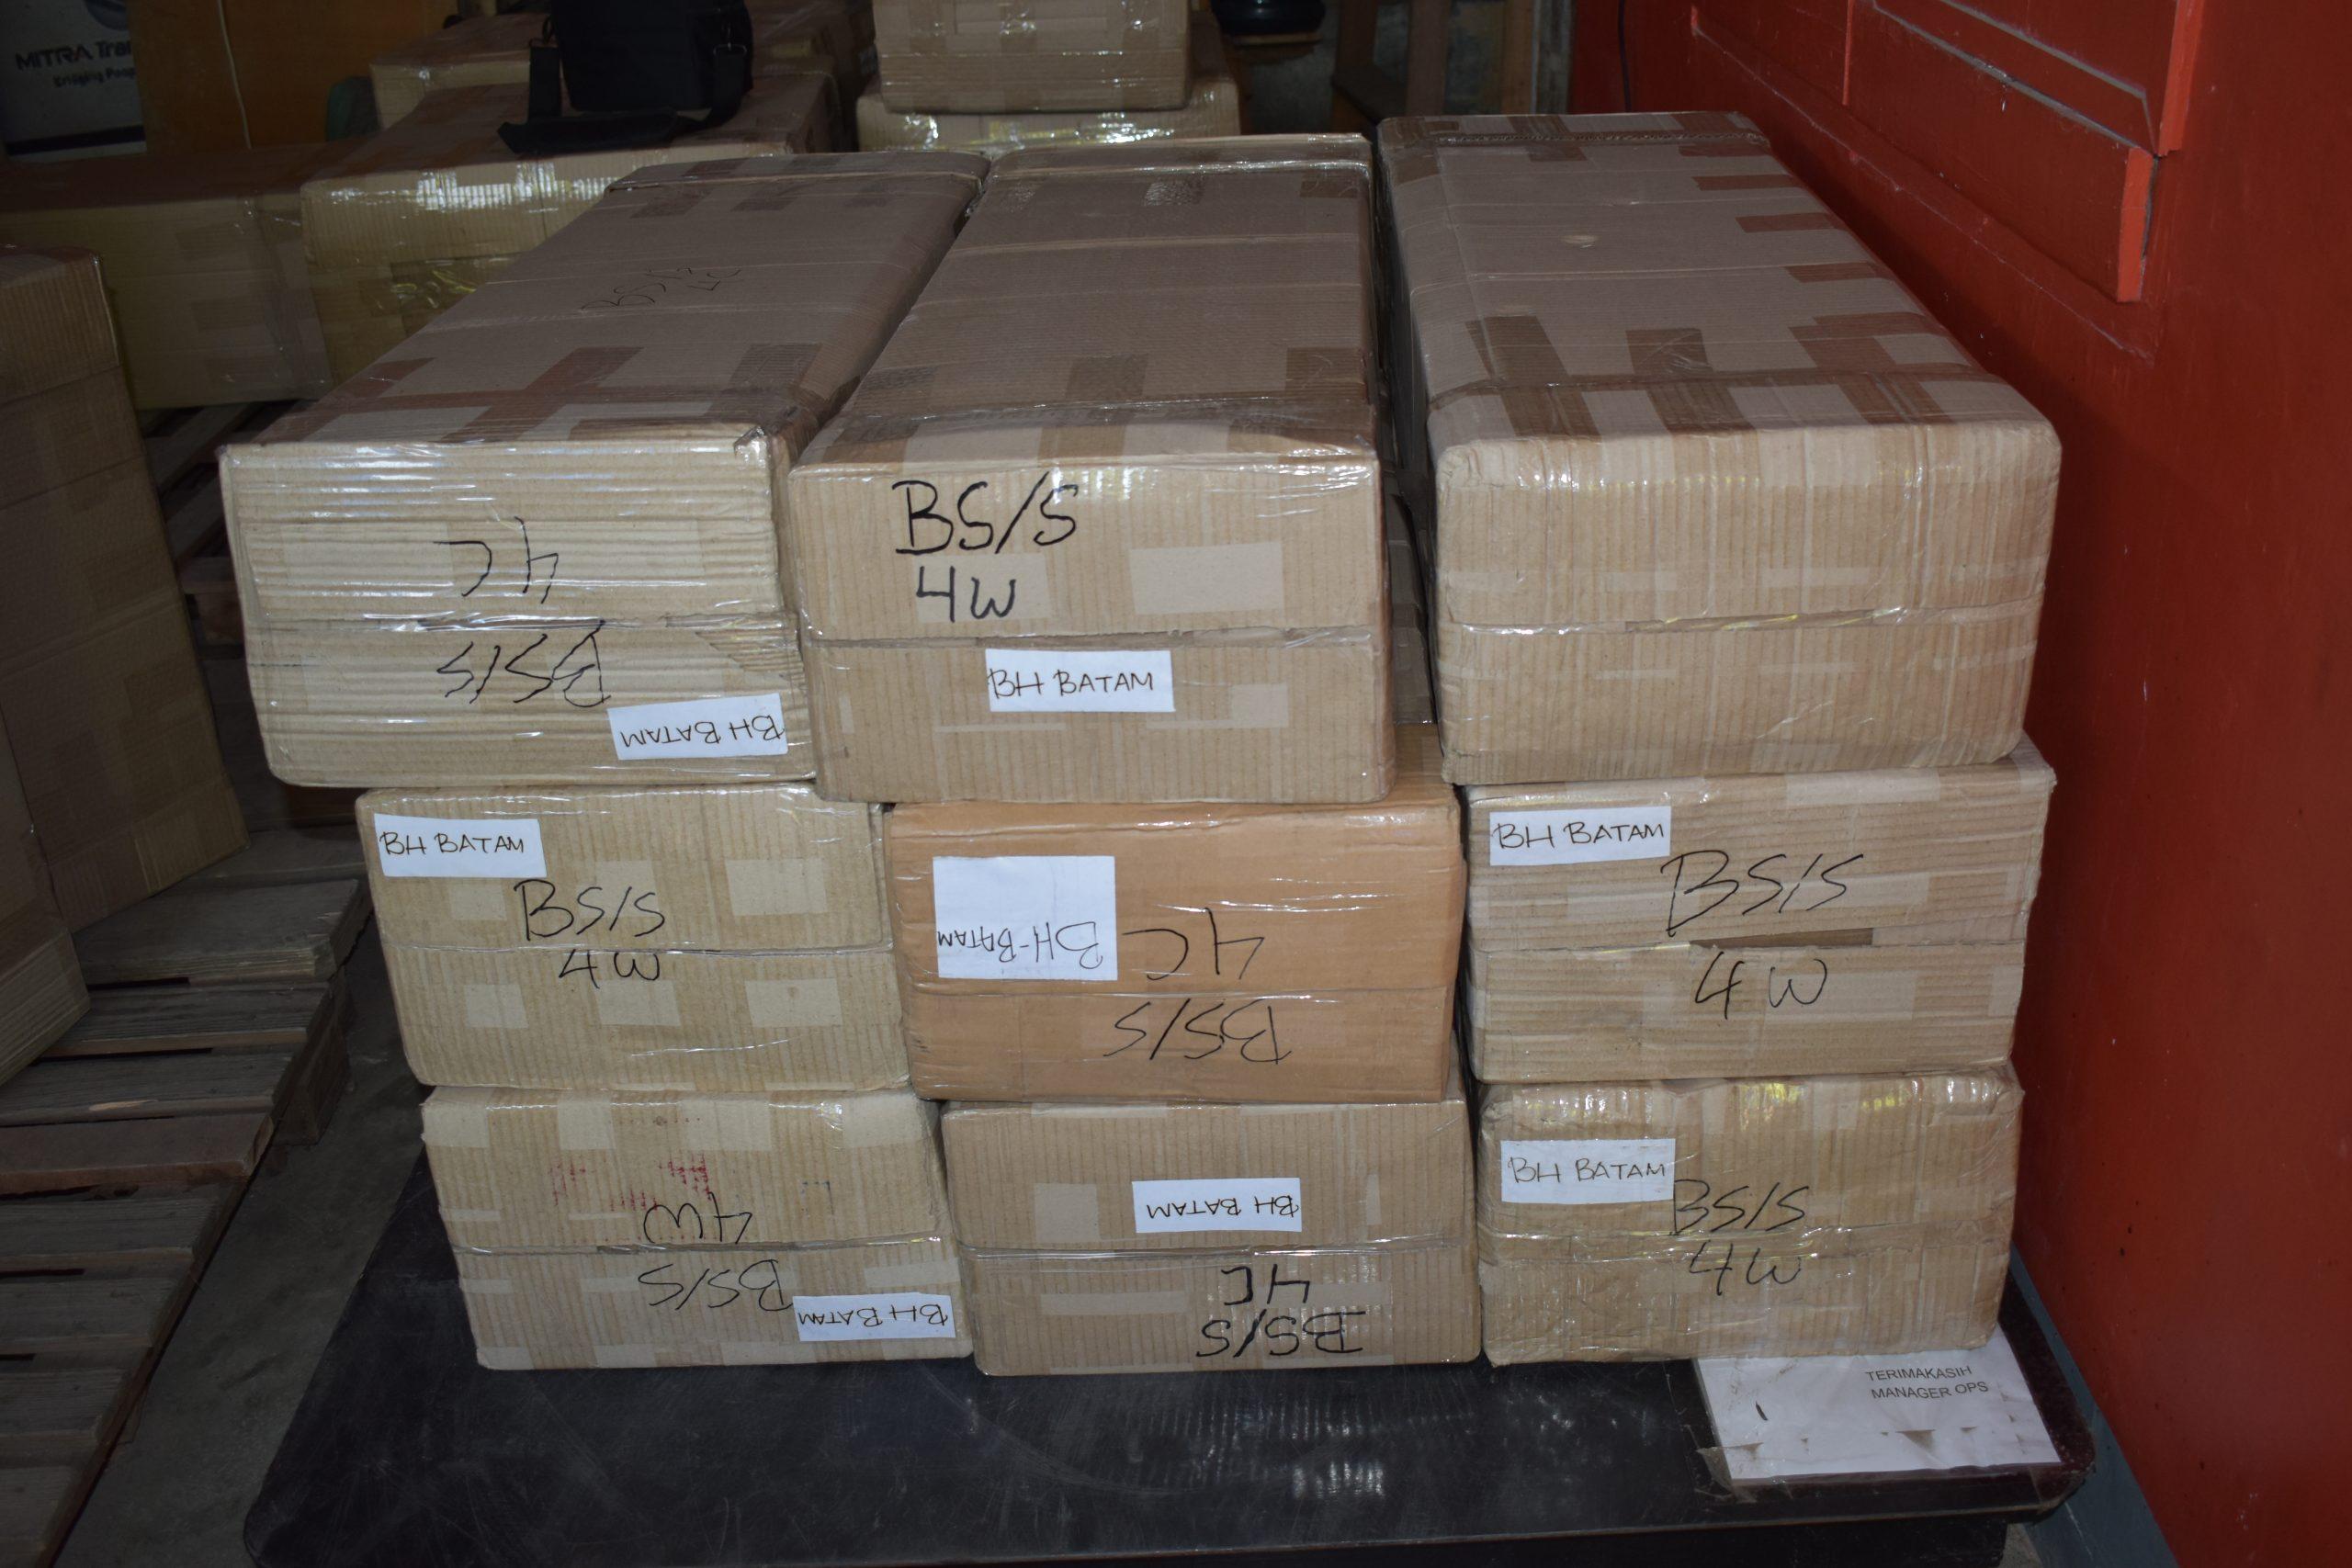 pengiriman barang dari pematang siantar ke jakarta